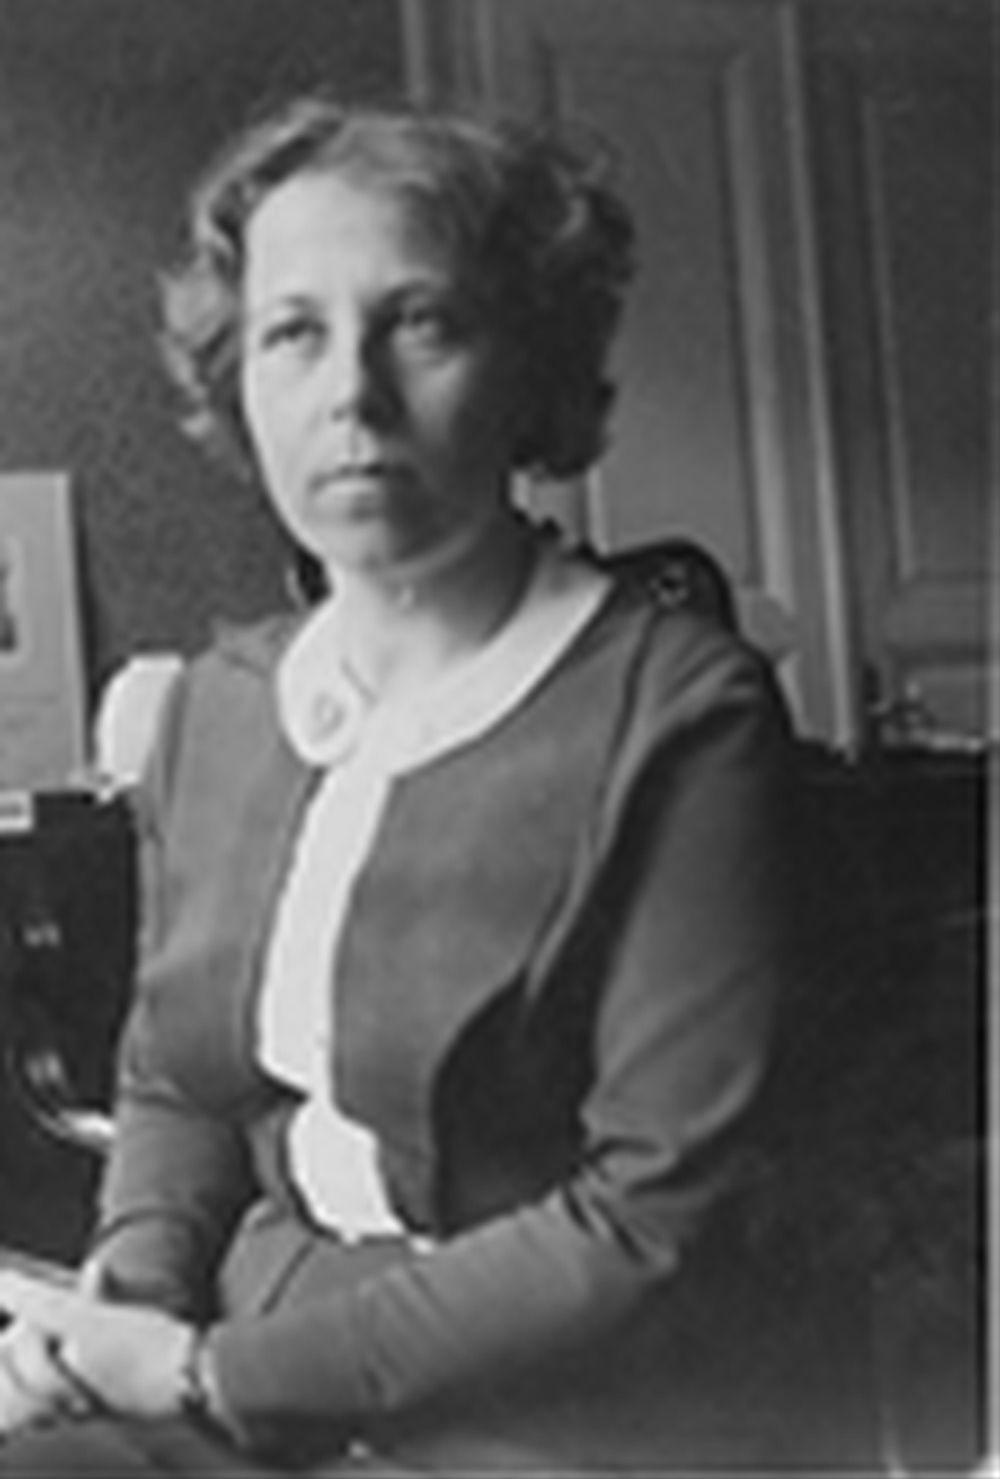 FELJTON: Ljevičarka iz plemićke obitelji koja je ljubila ženu